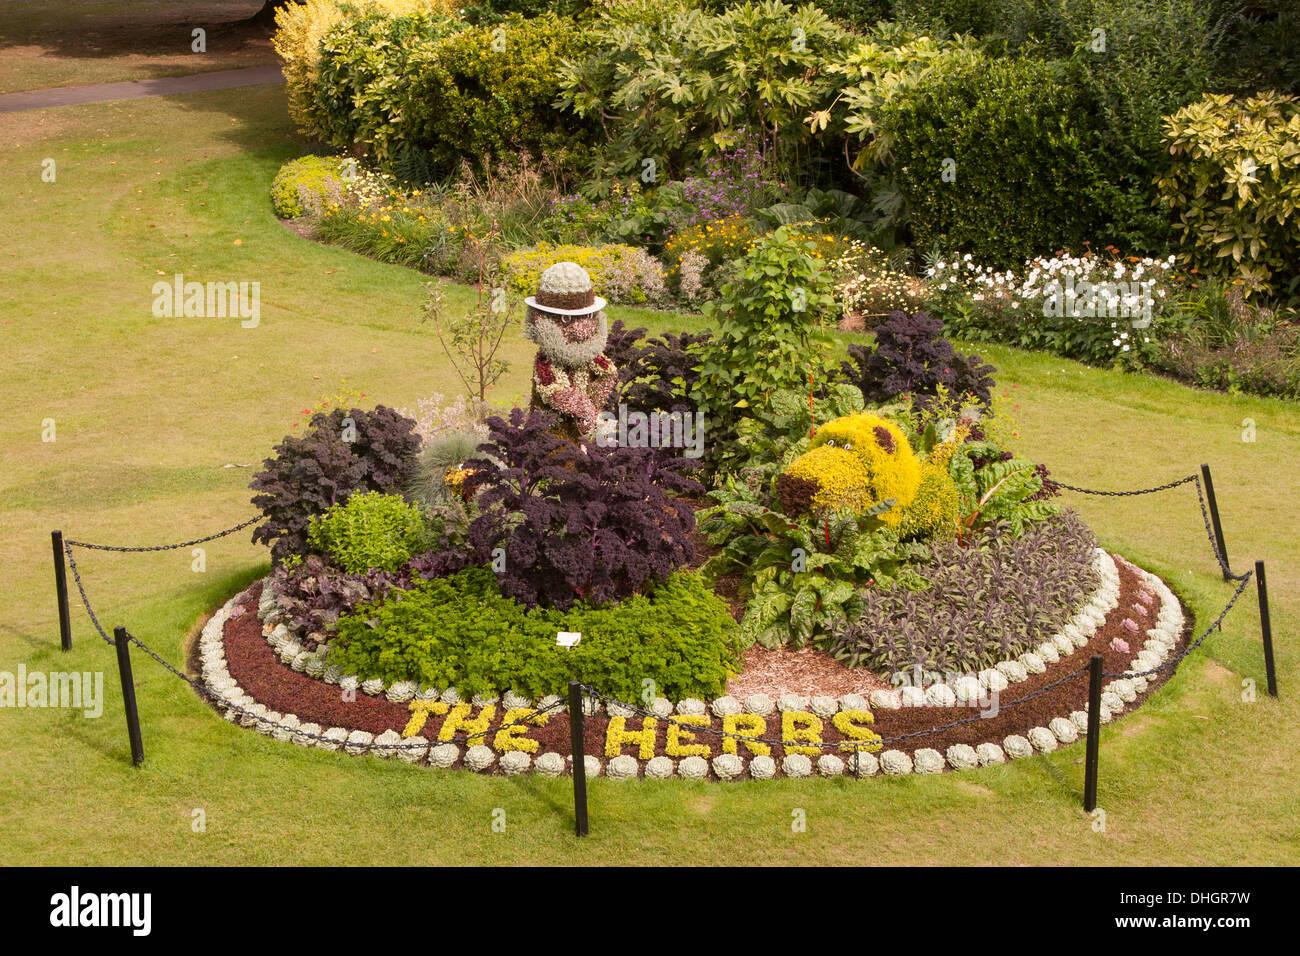 Herb Garden in city park in Bath, Somerset, England, Great Britain - Stock Image